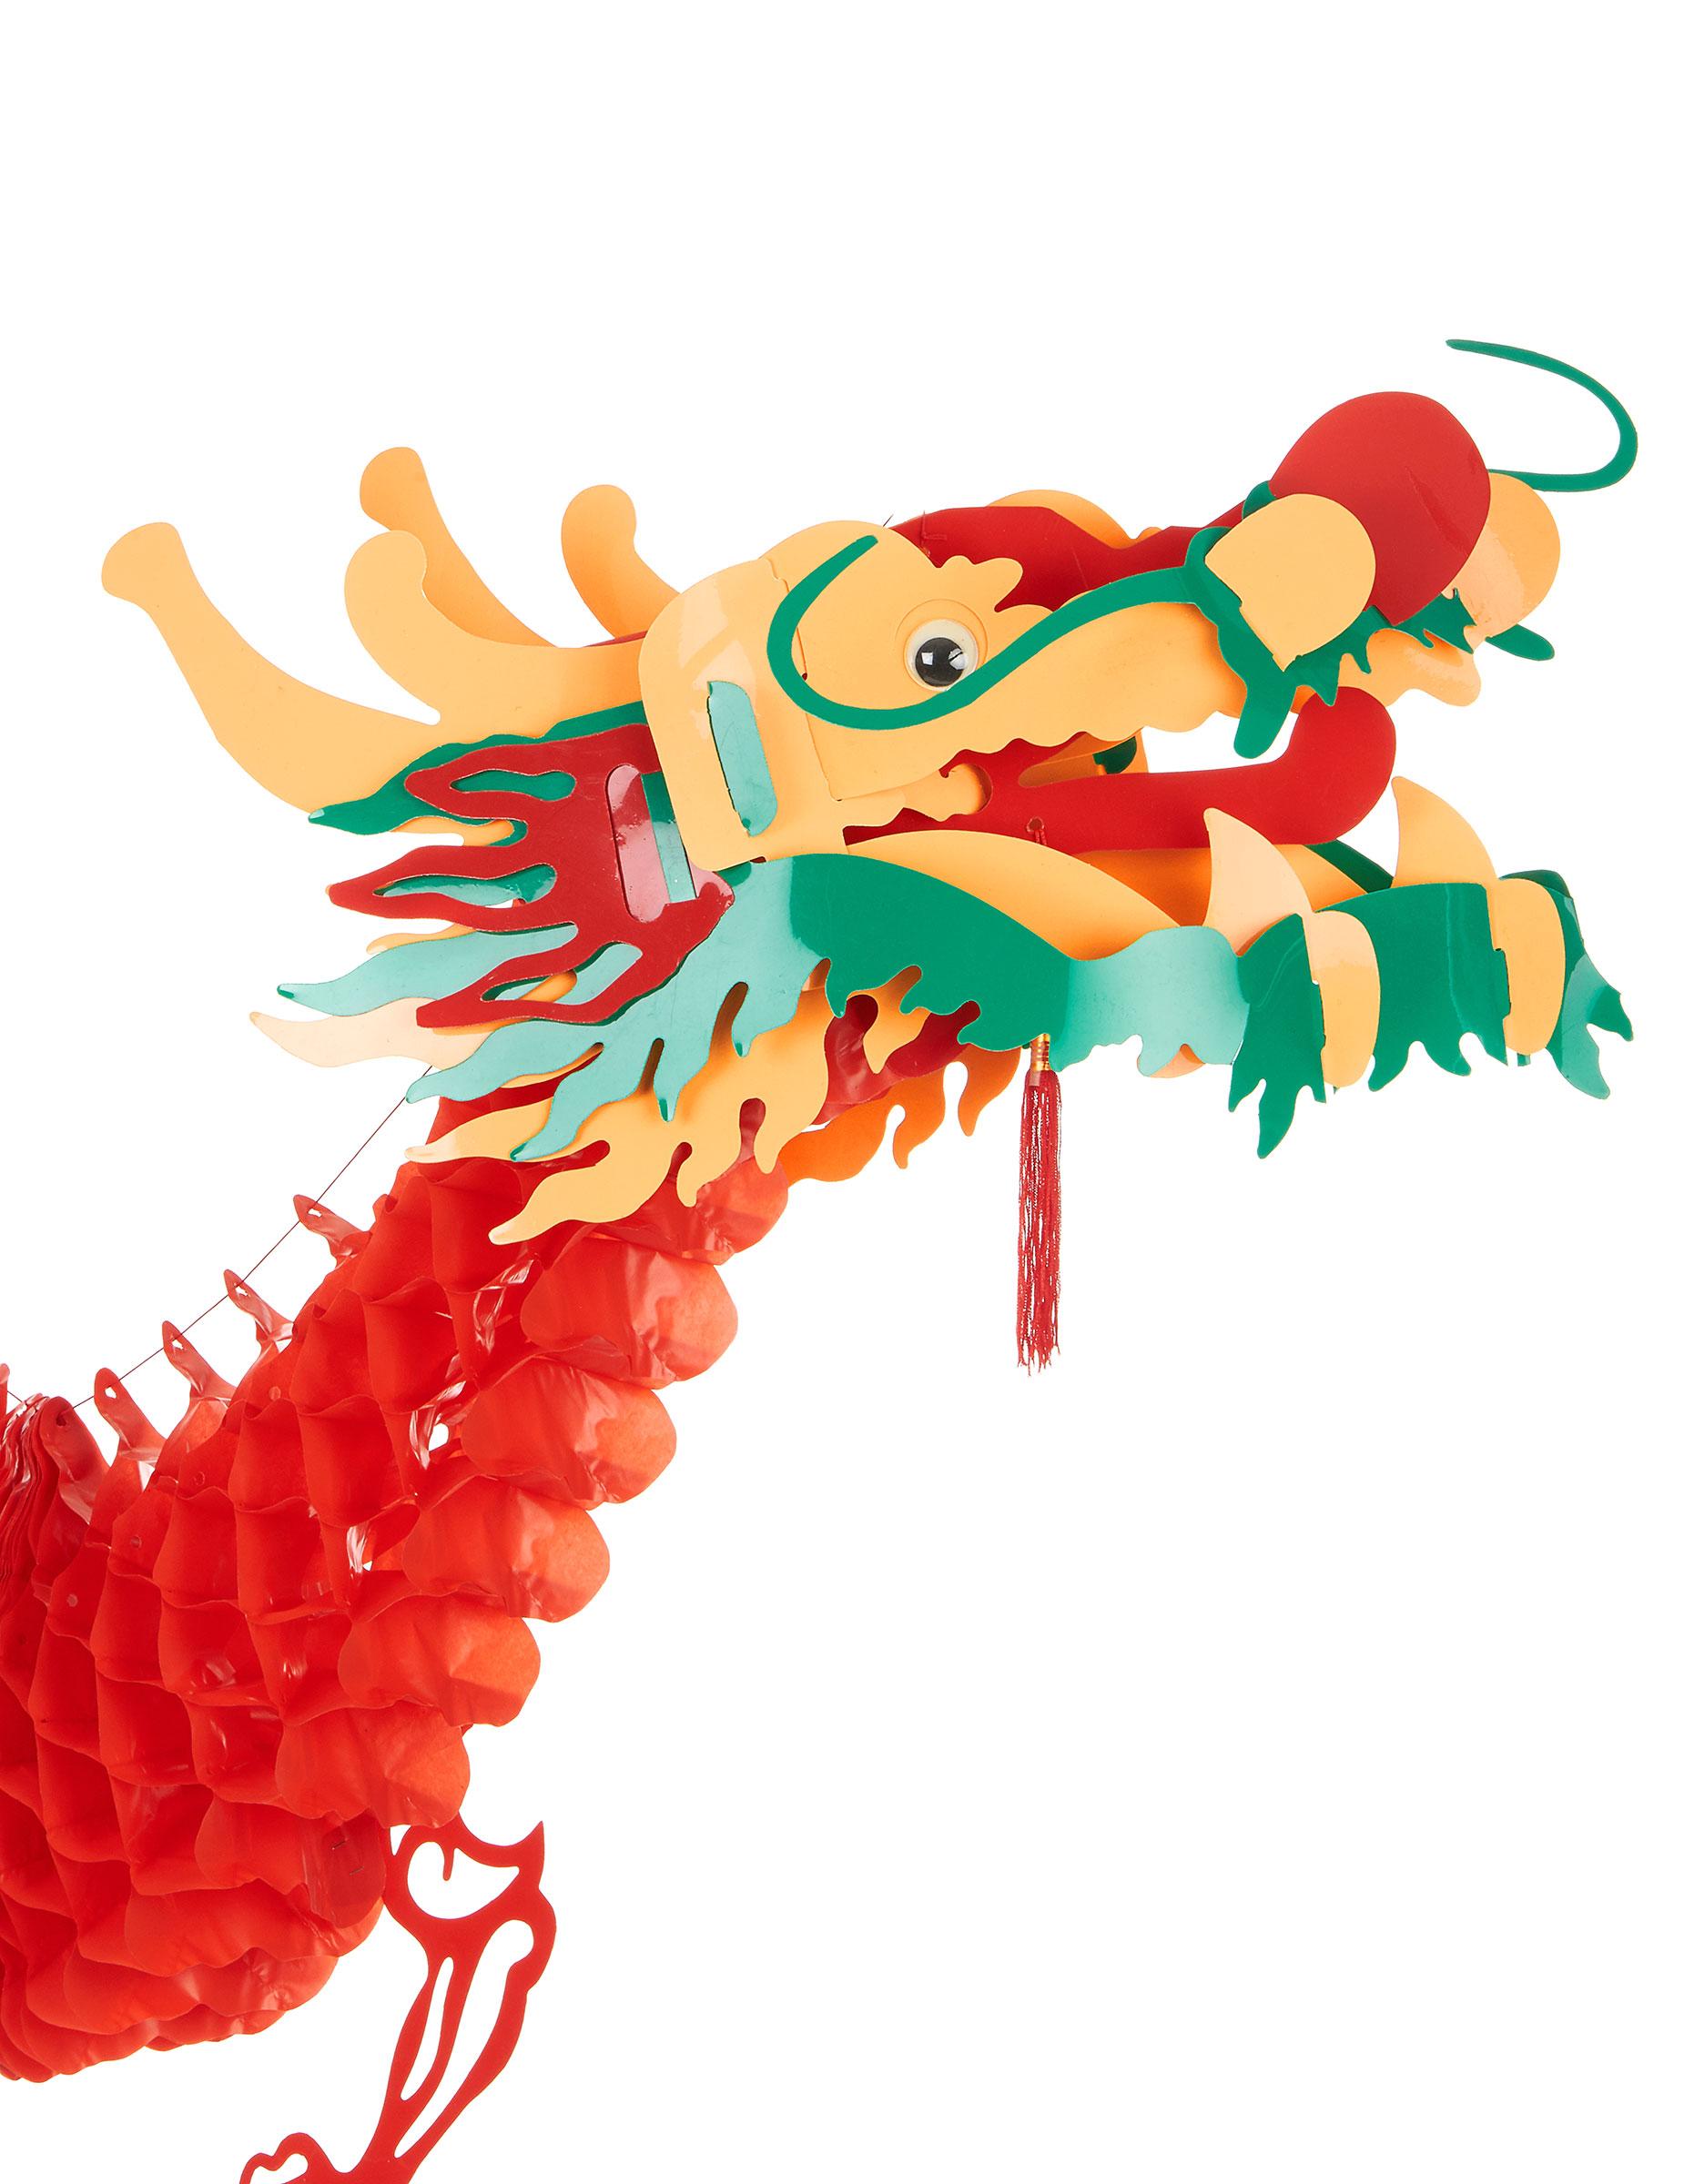 D coration dragon rouge 2 5 m nouvel an chinois deguise for Decoration nouvel an chinois